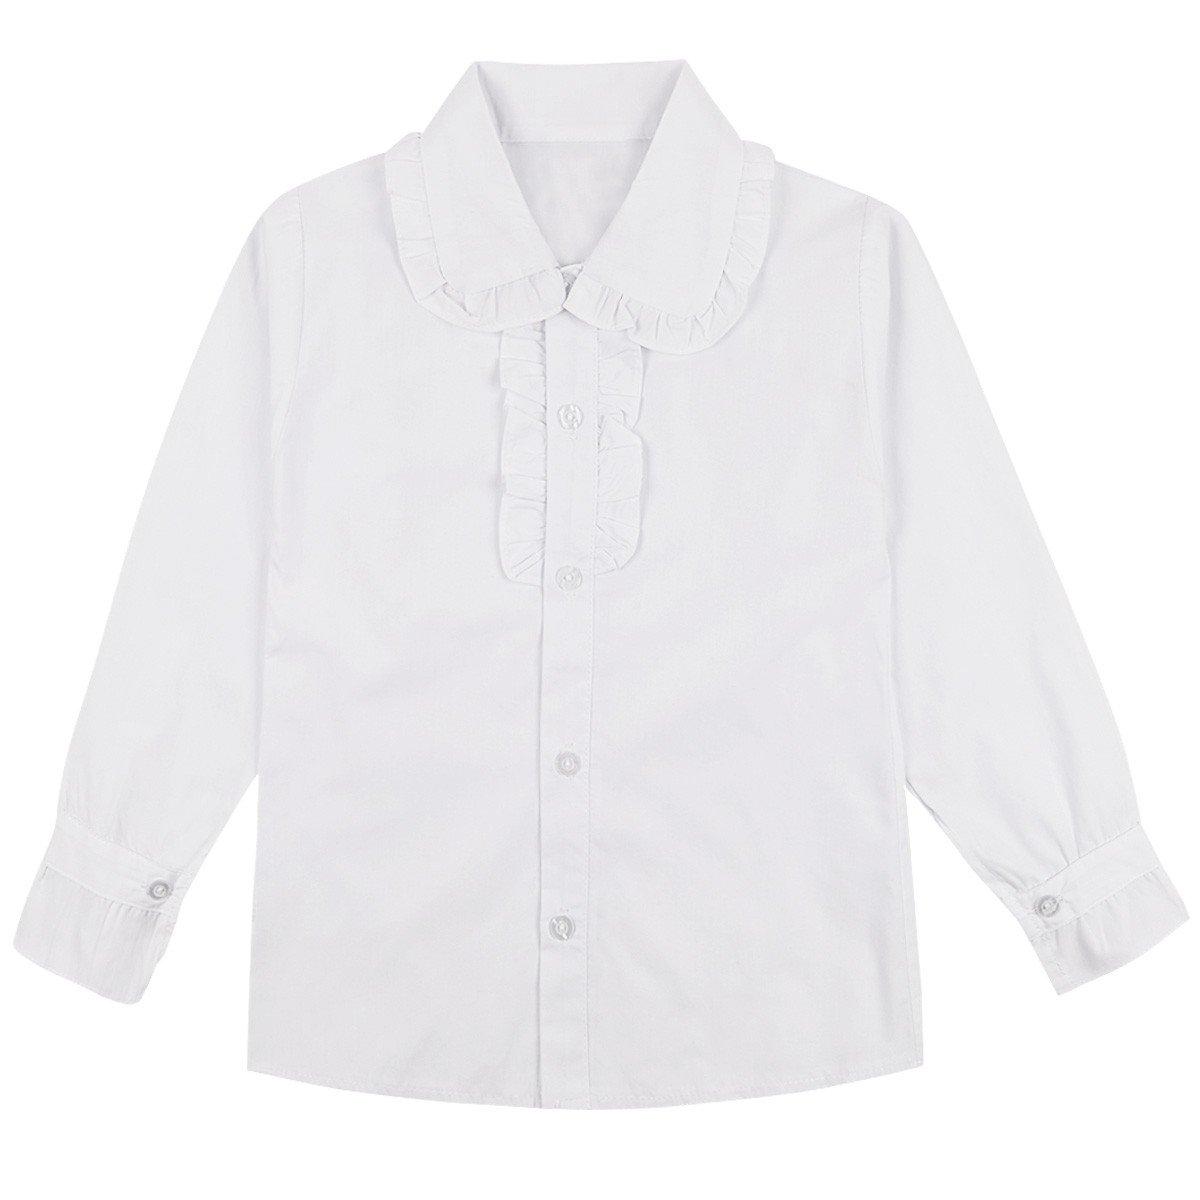 YiZYiF White School Uniform Tops Long/Short Sleeve Ruffle Collar Blouse for Little Big Girls Long Sleeve 7-8